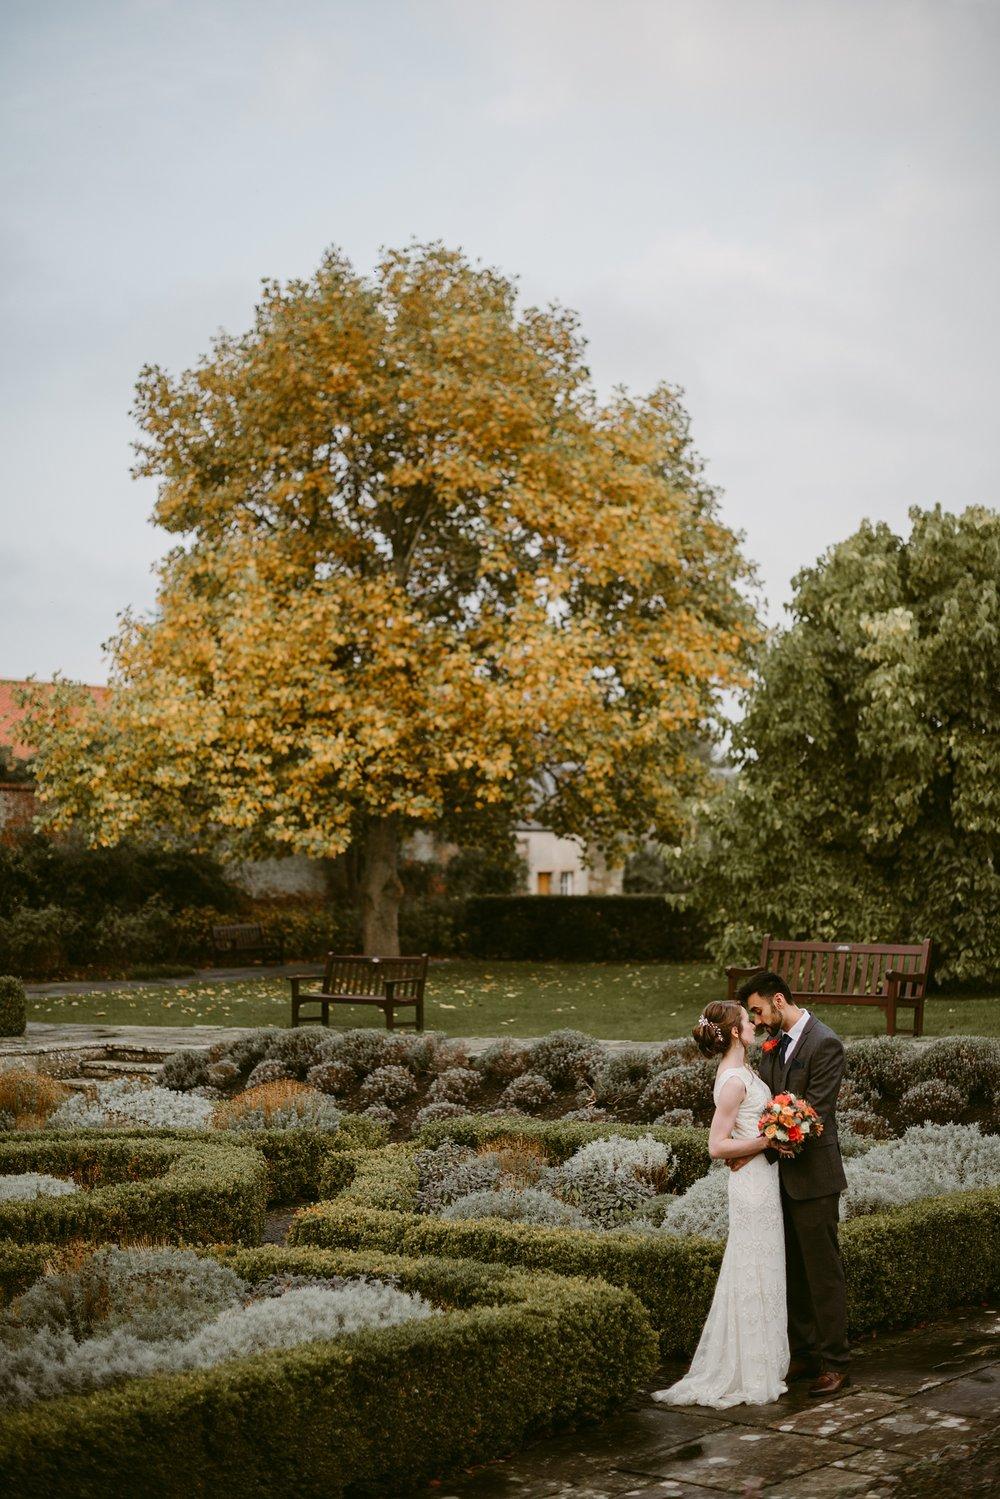 Claire-Fleck-Scottish-wedding-photography-2017__0007.jpg